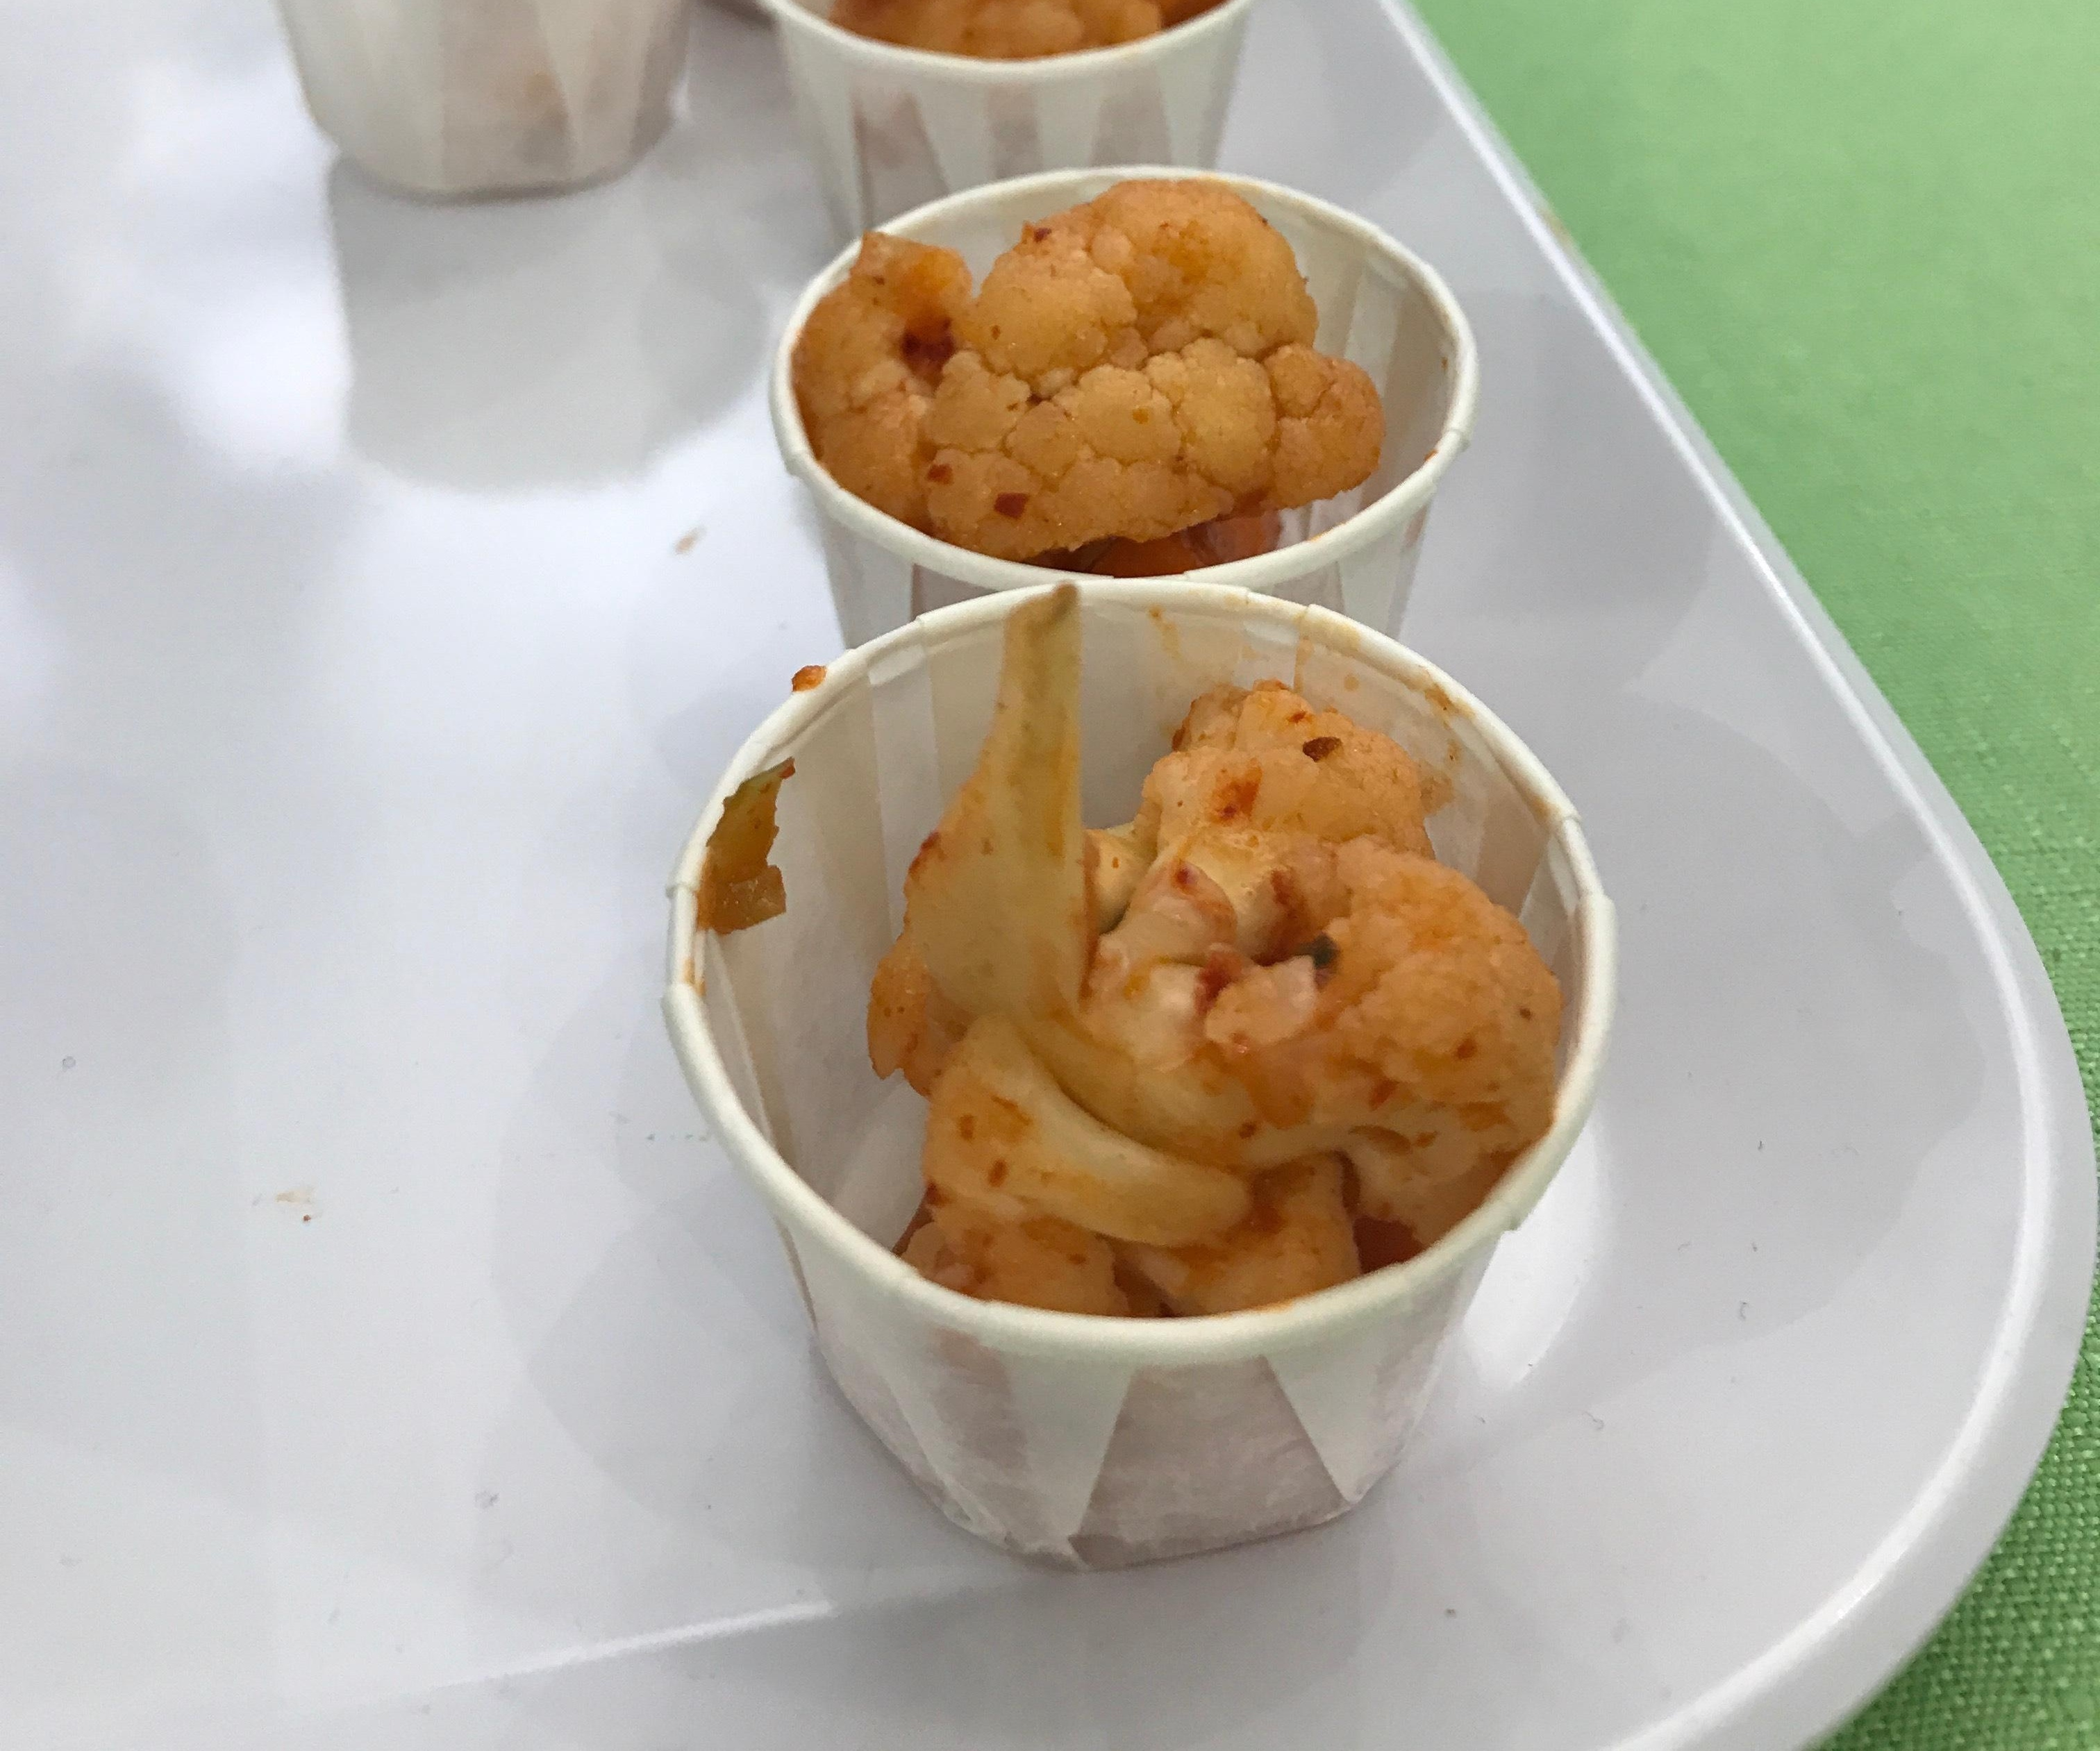 Kimchi Cauli-562609-edited.jpeg